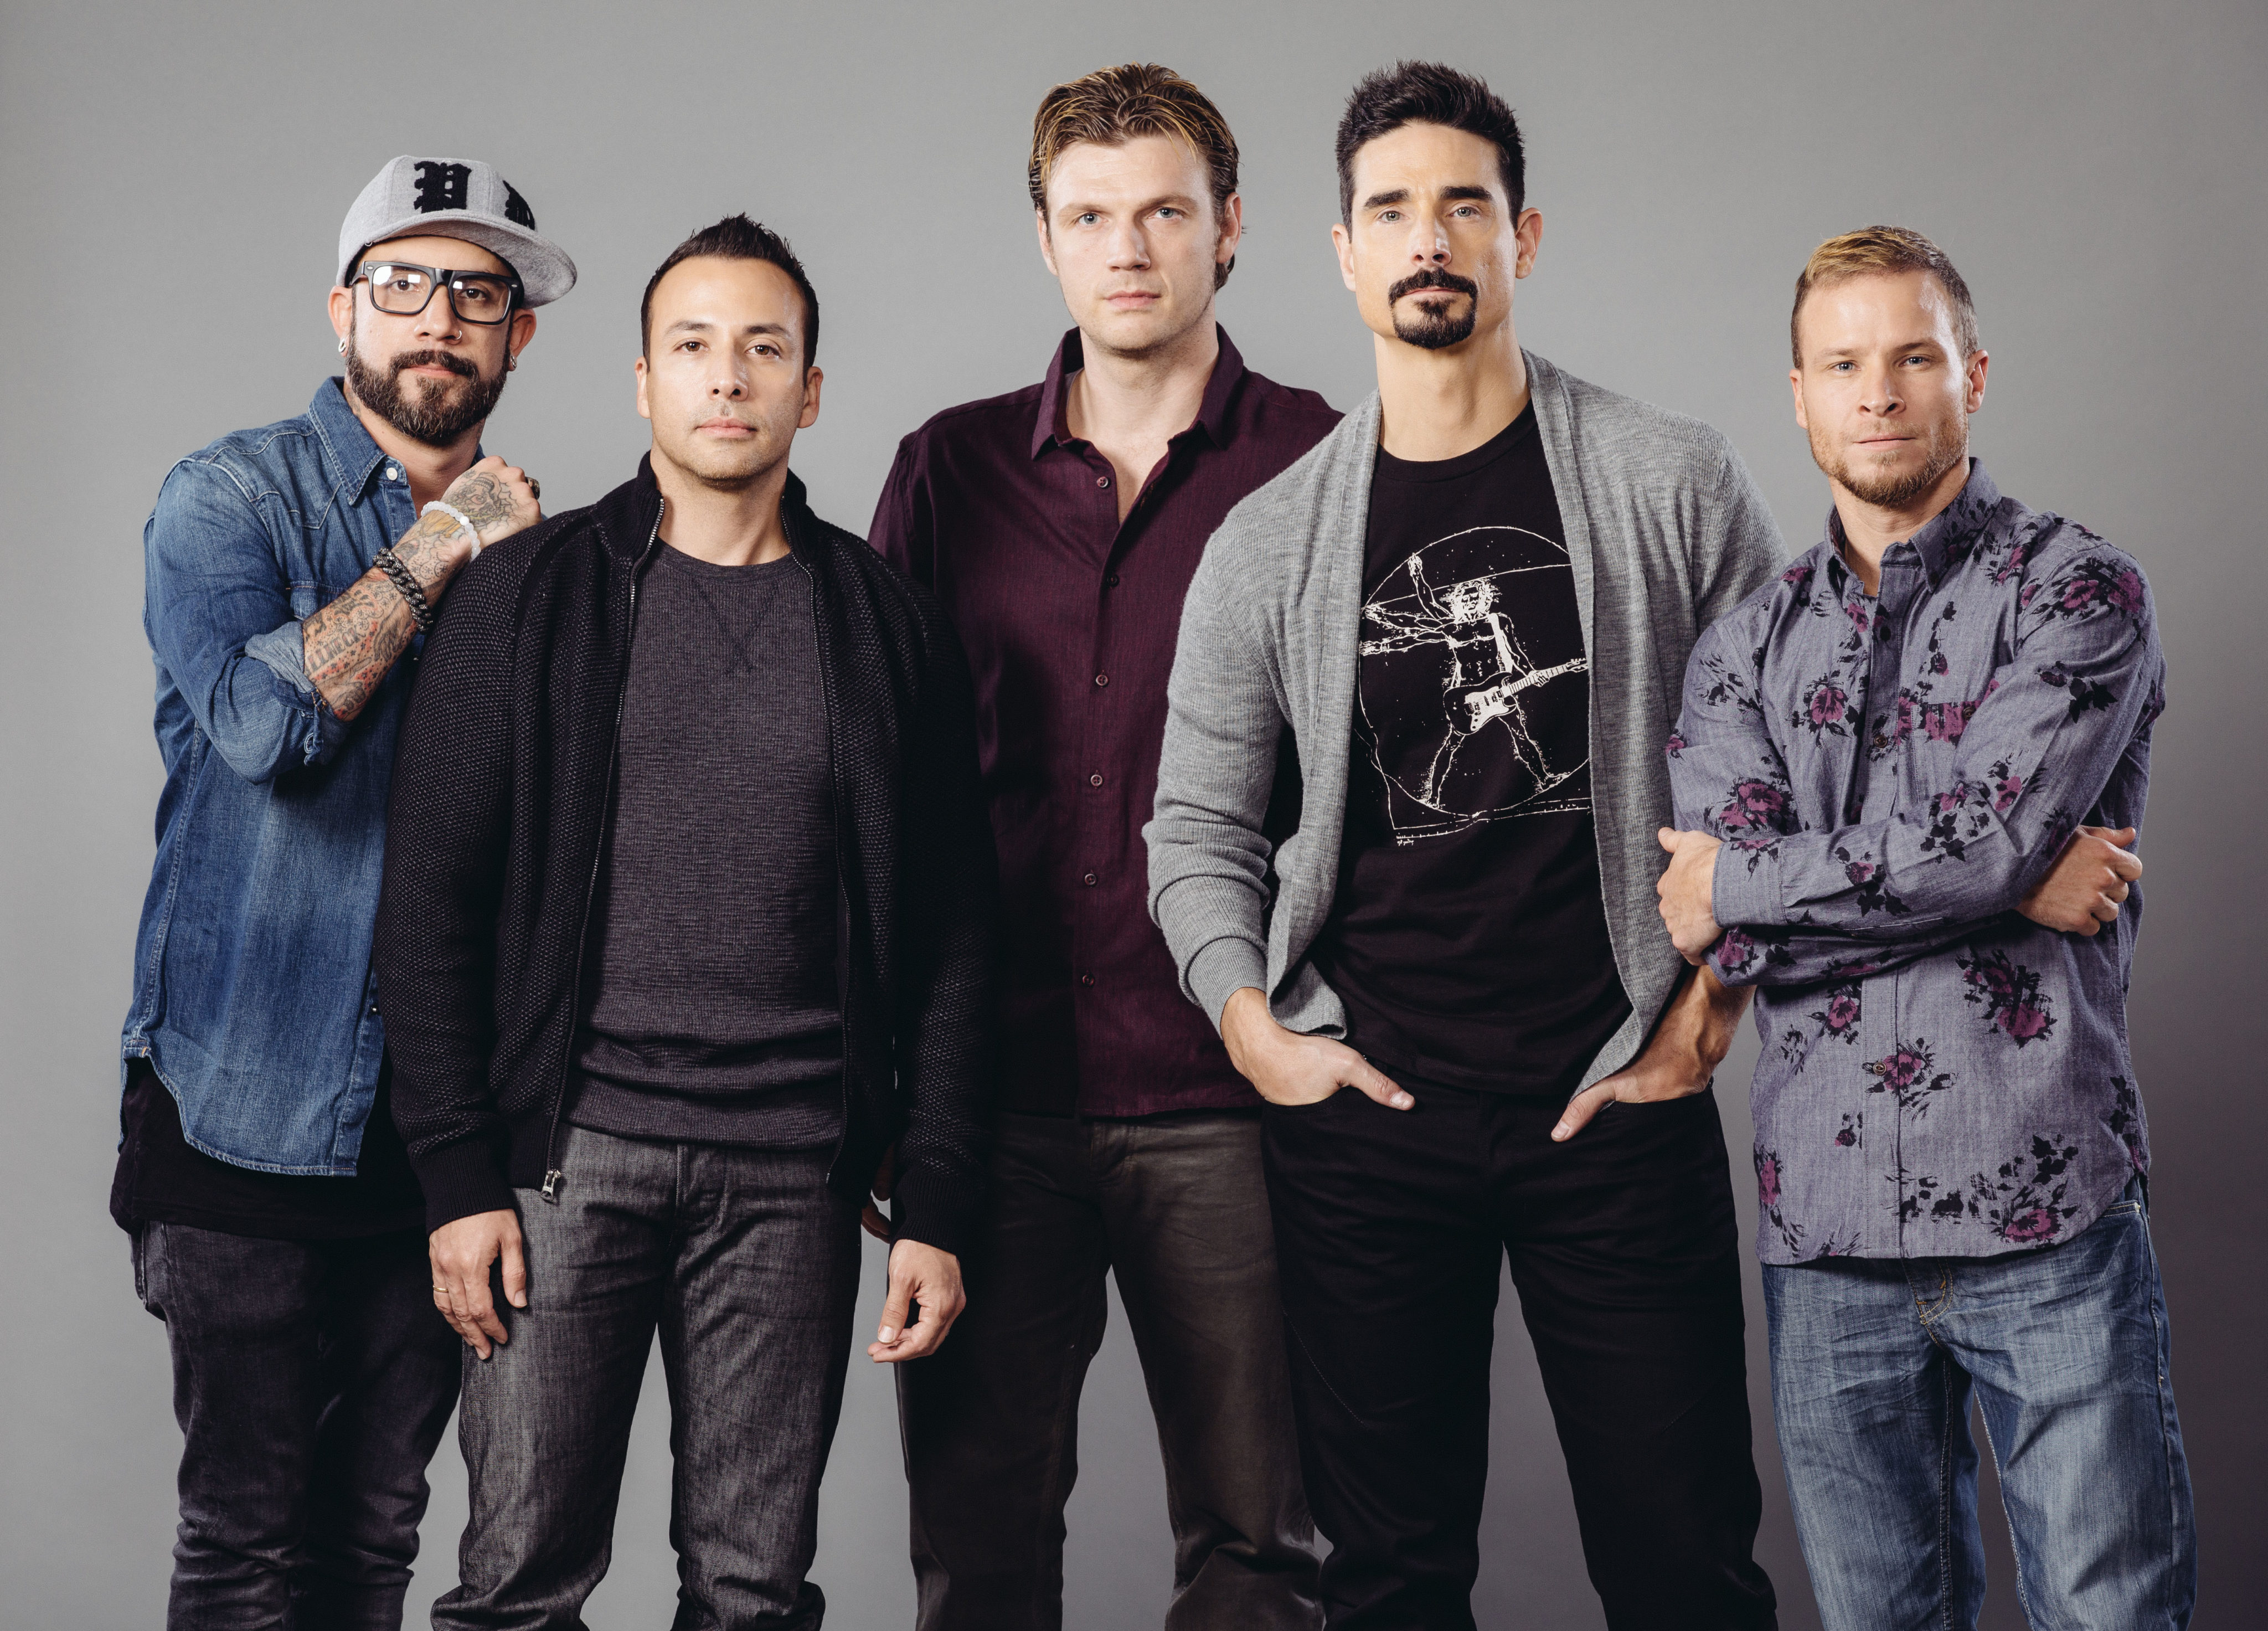 backstreet boys  Backstreet Boys release new single and video | WTOP